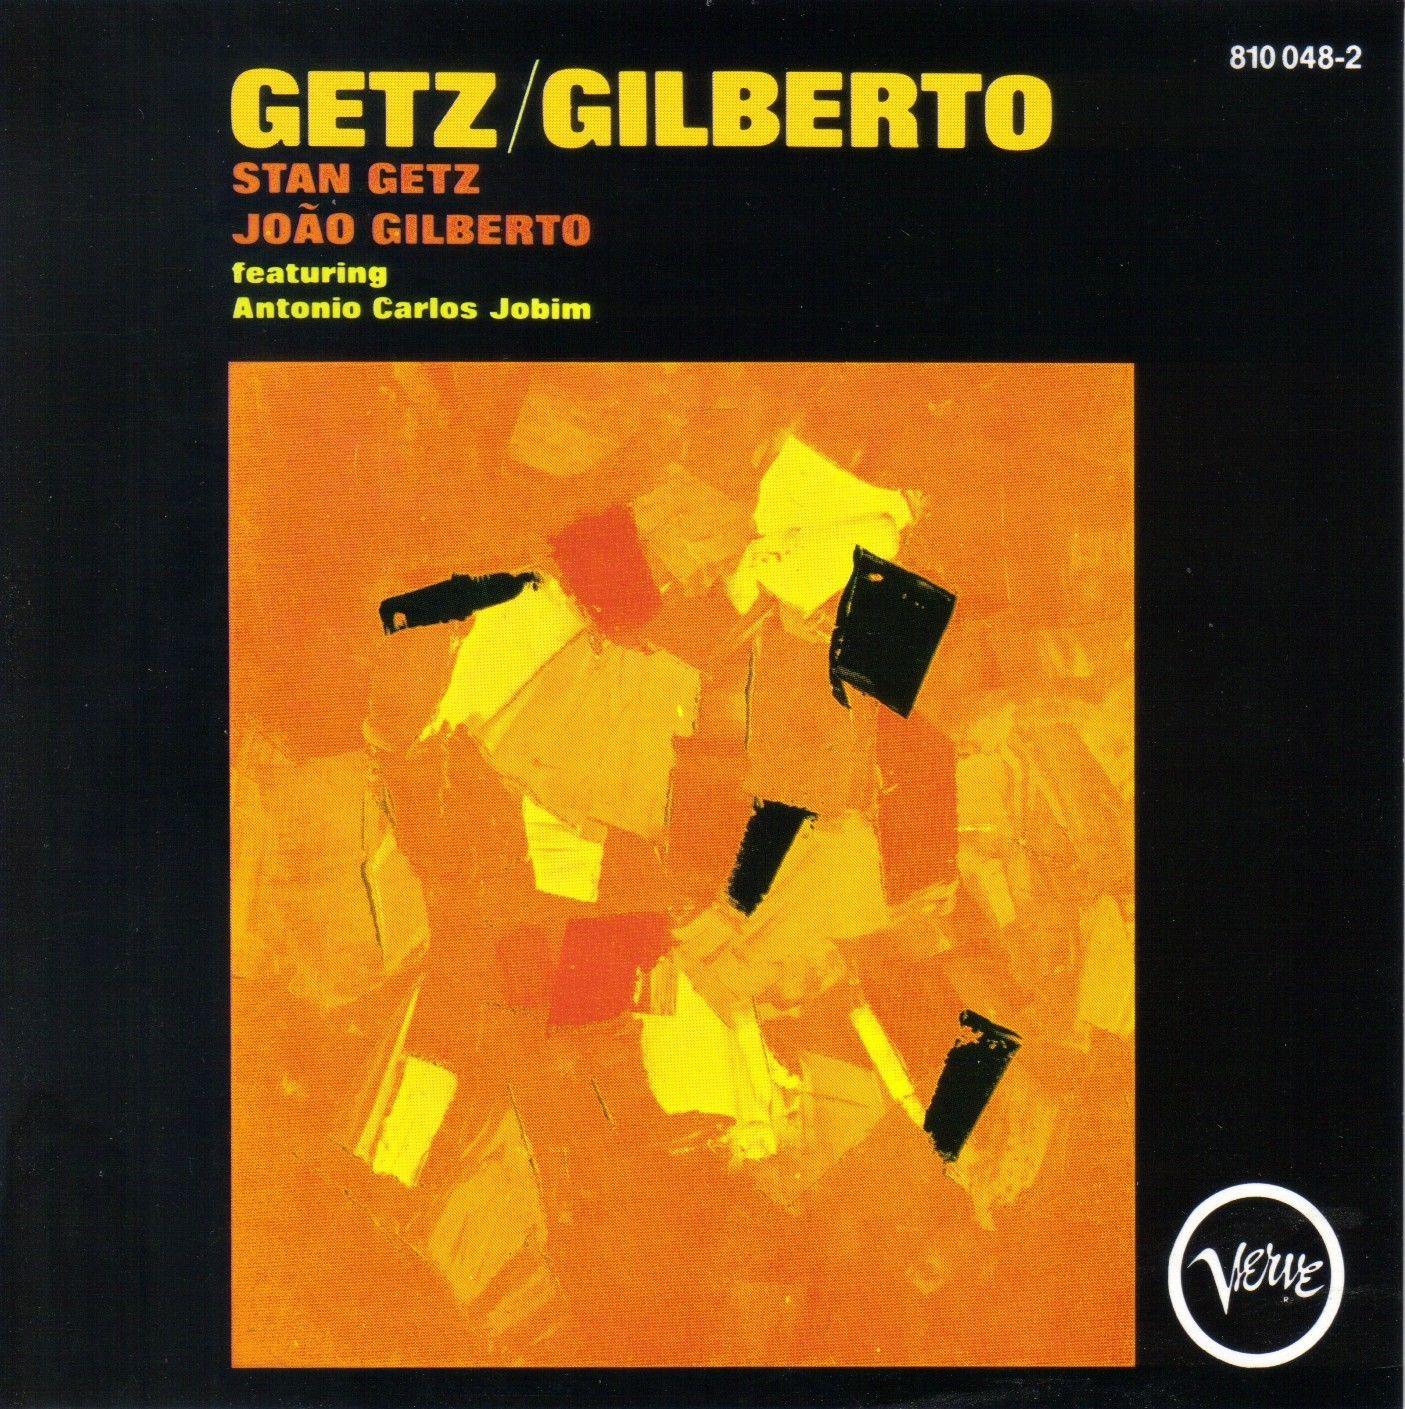 Getz Gilberto Stan Getz Joao Gilberto Featuring Antonio